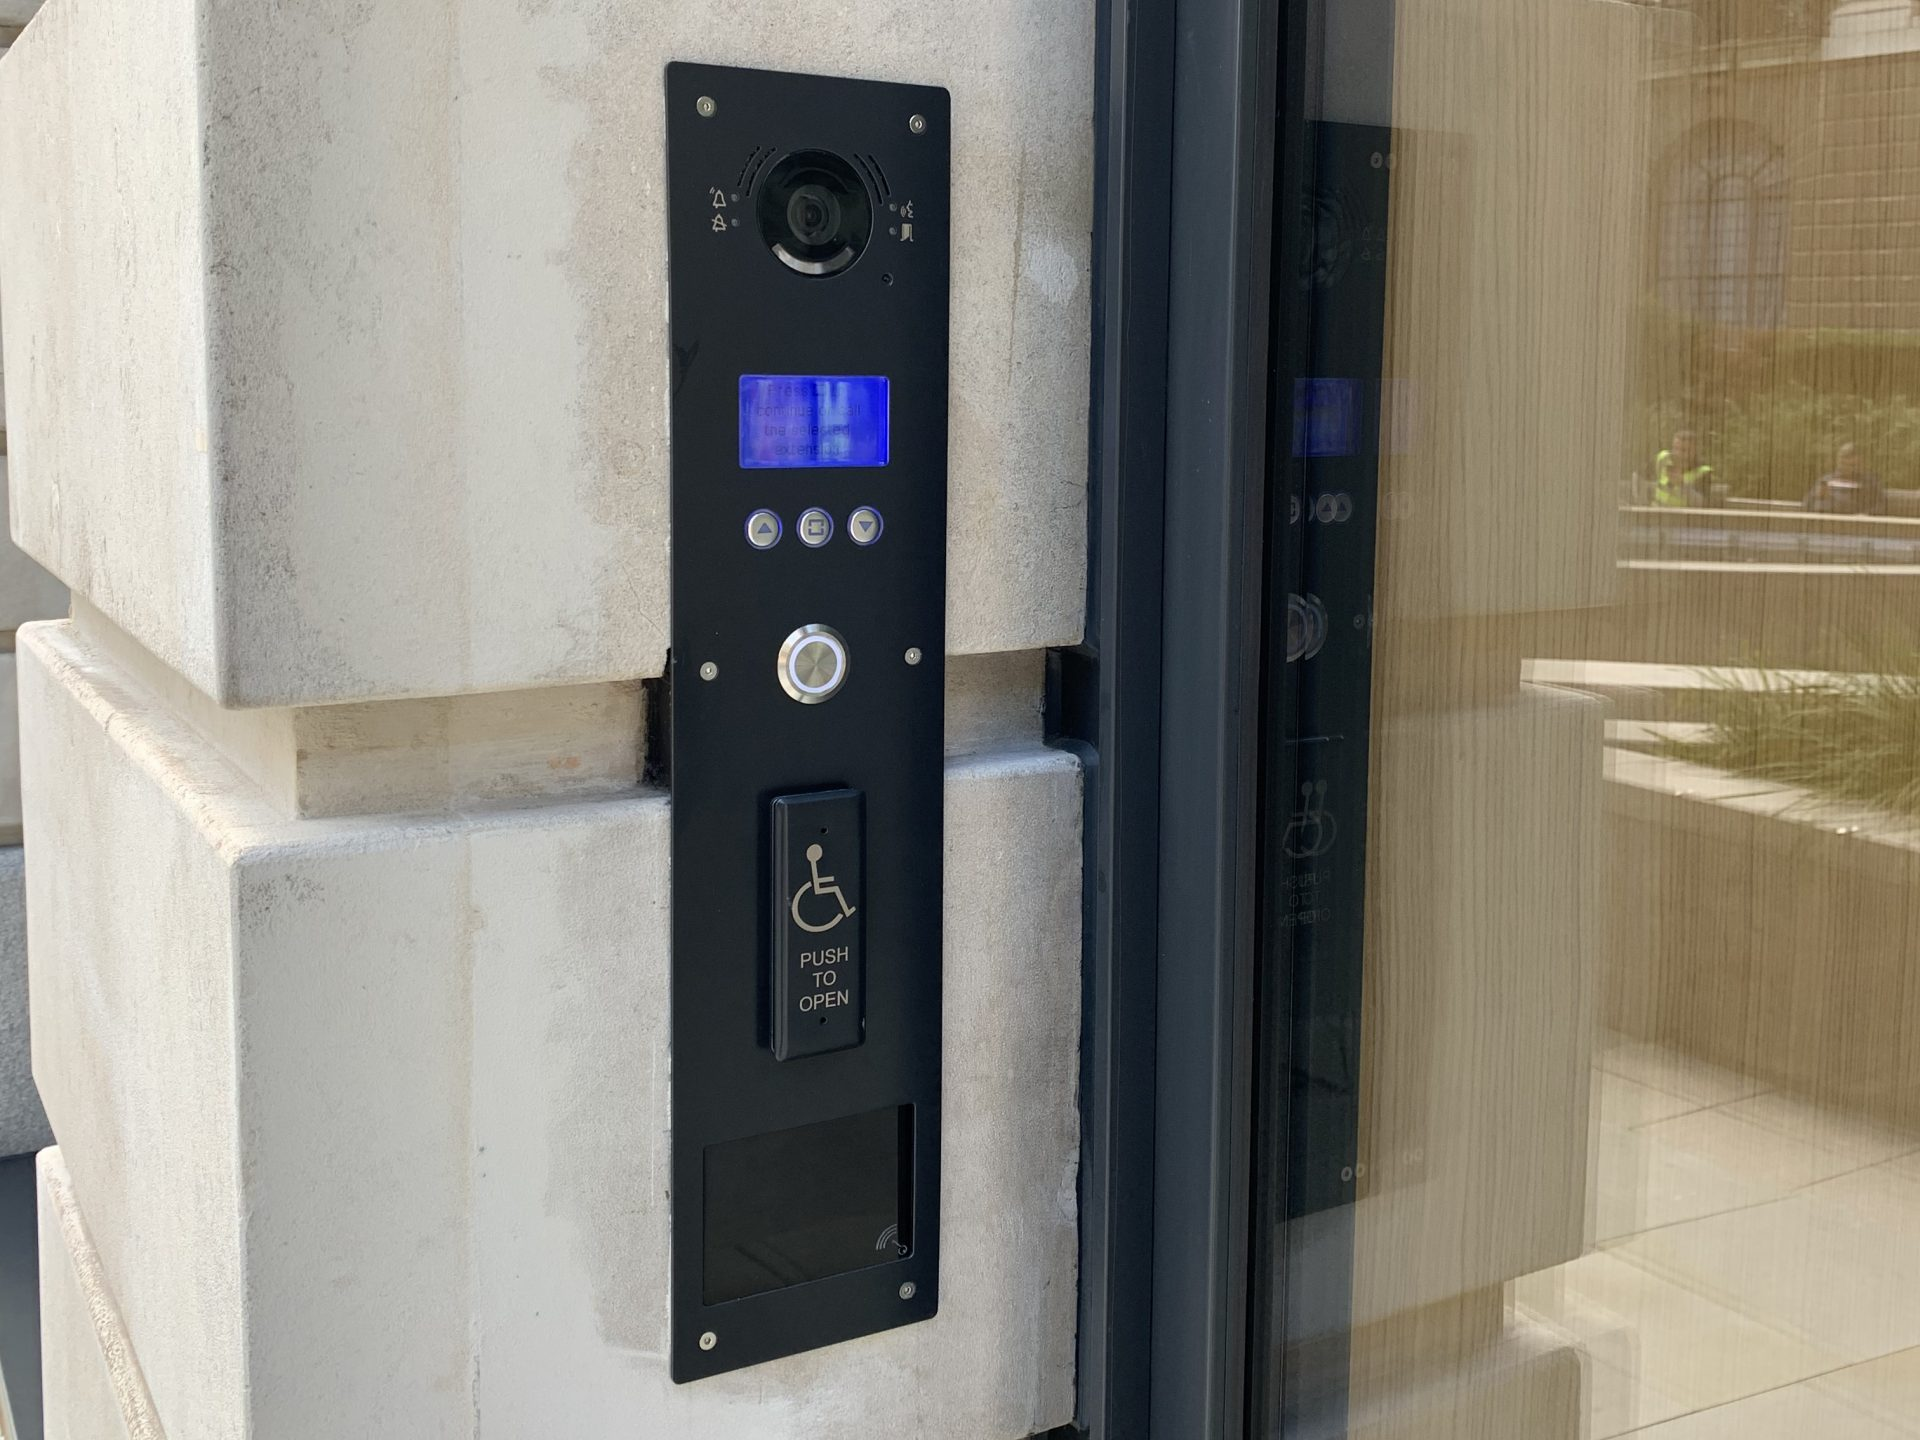 The Bailey_intercom and door access